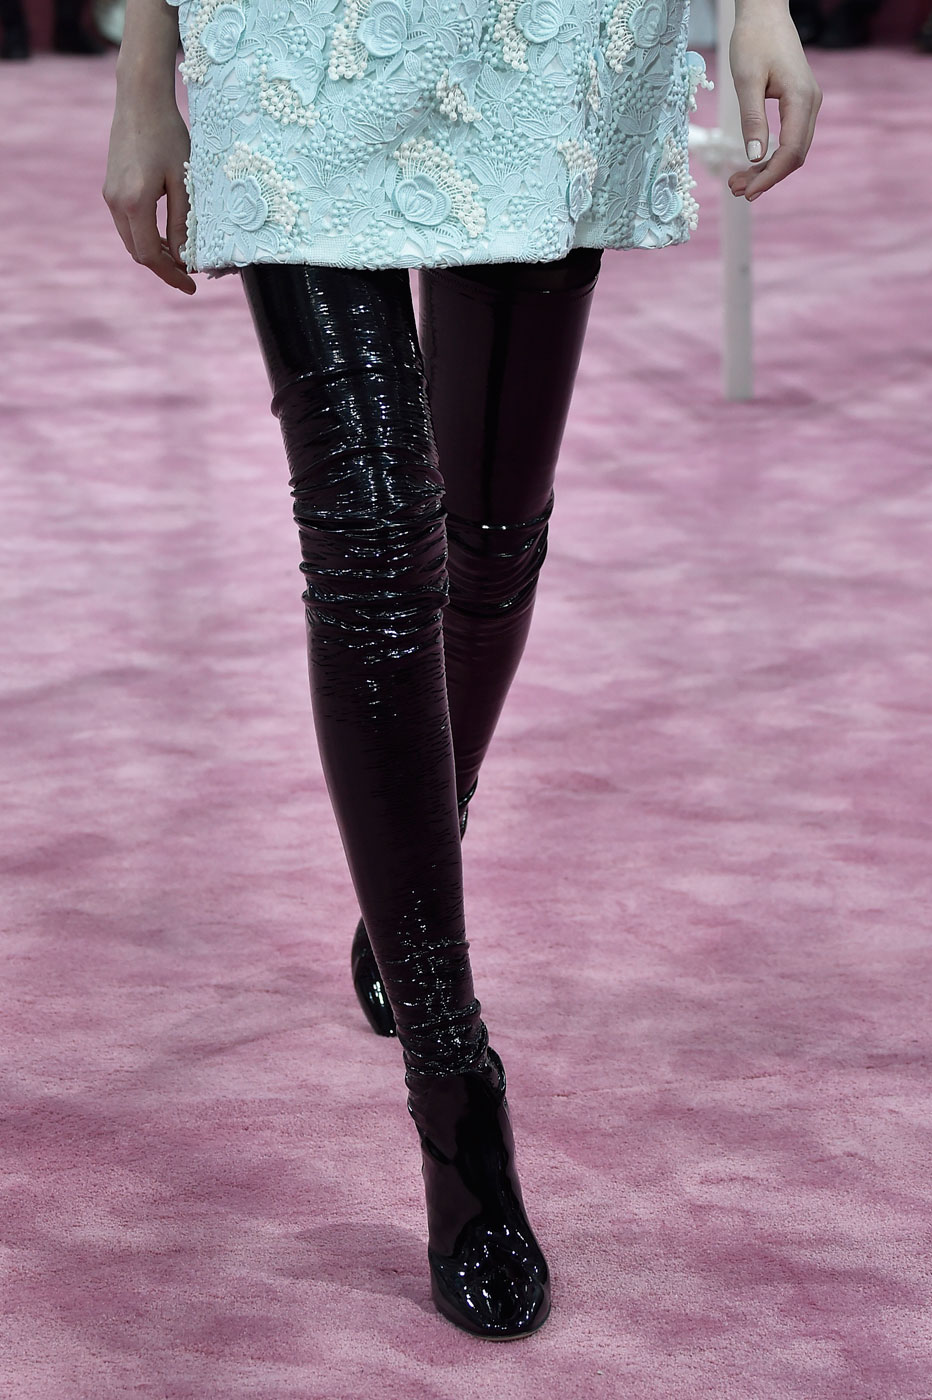 Christian-Dior-fashion-runway-show-close-ups-haute-couture-paris-spring-summer-2015-the-impression-043